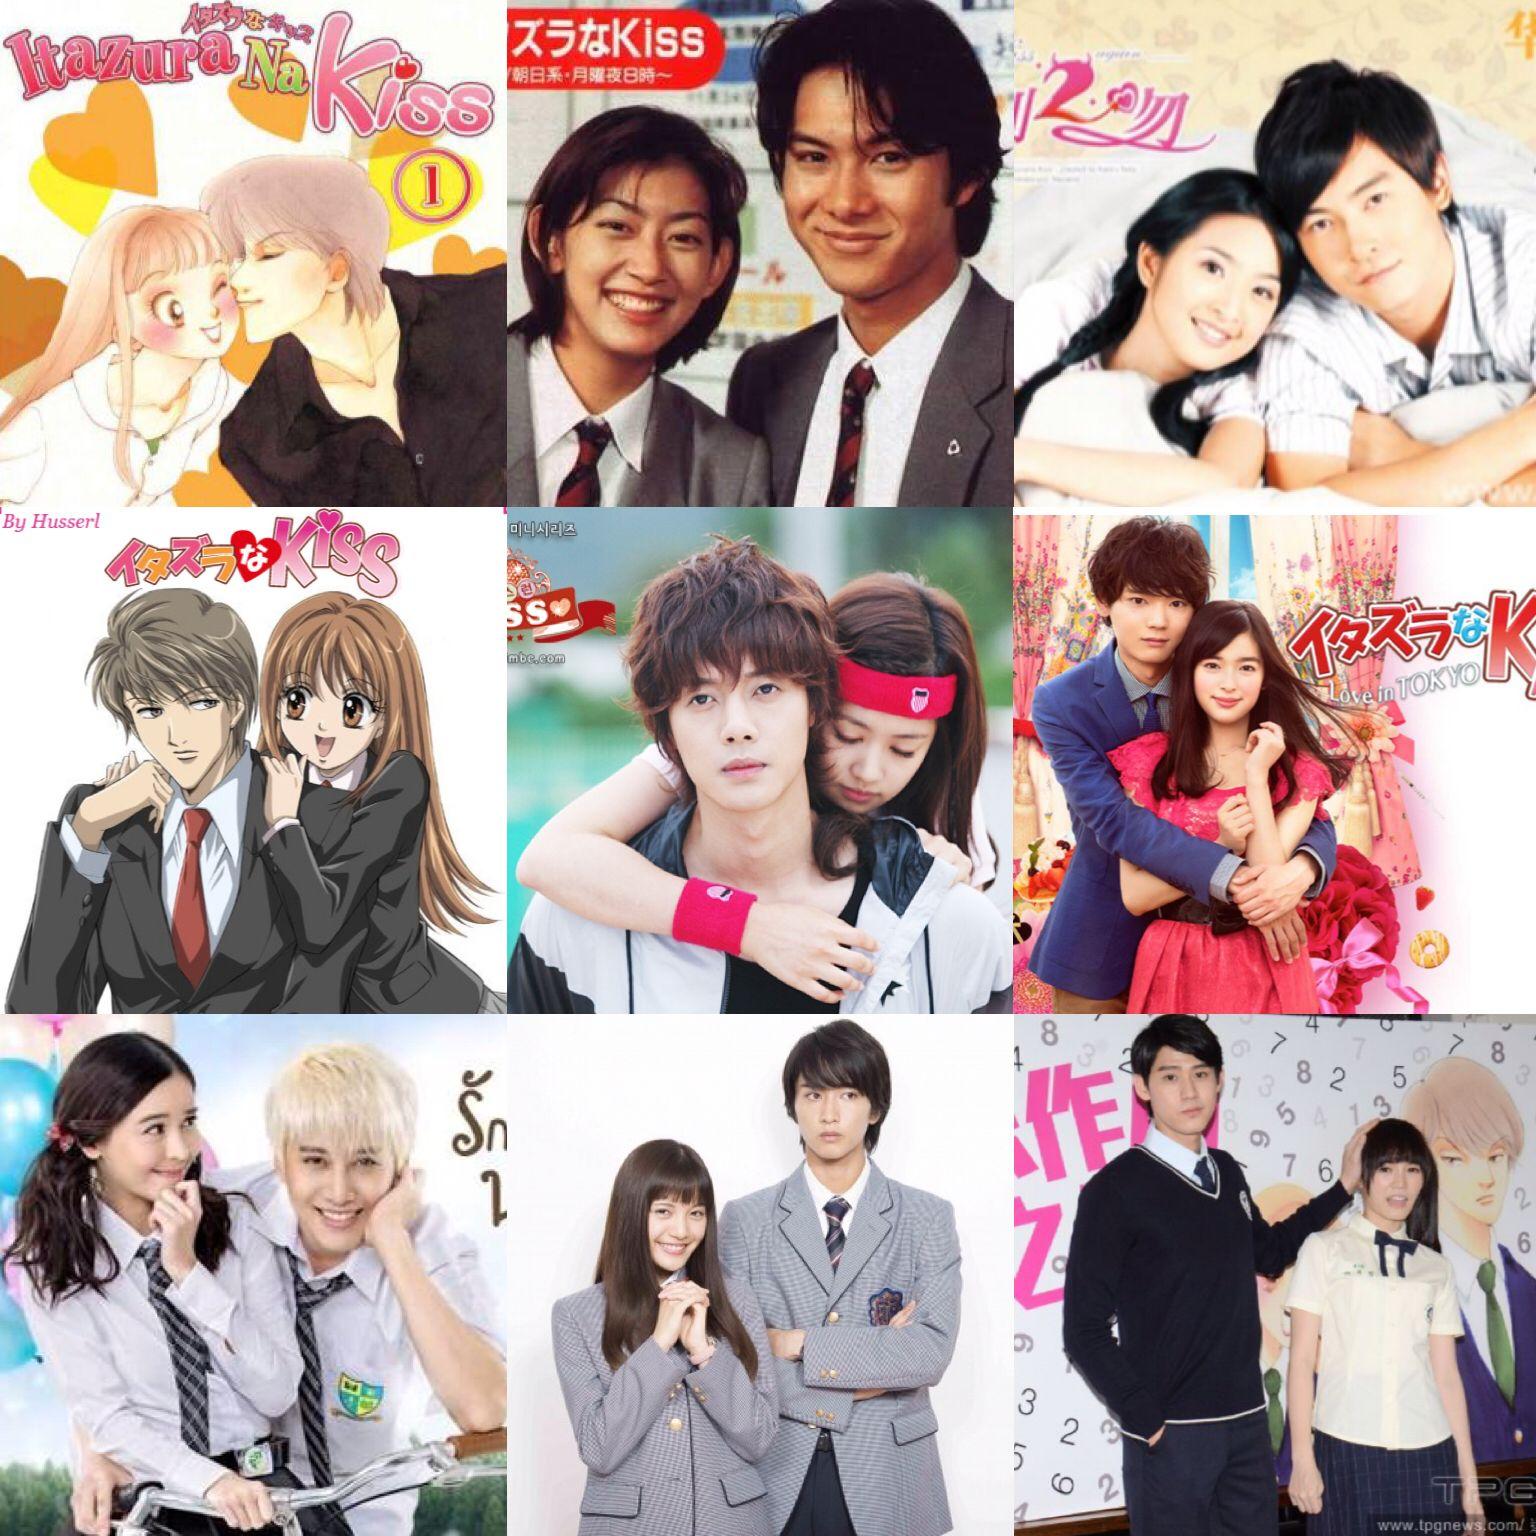 All The Versions 1990 1997 Itazura Na Kiss Manga 1996 Itazura Na Kiss Live Action 2005 2006 It Started With A Itazura Na Kiss Japanese Drama Live Action